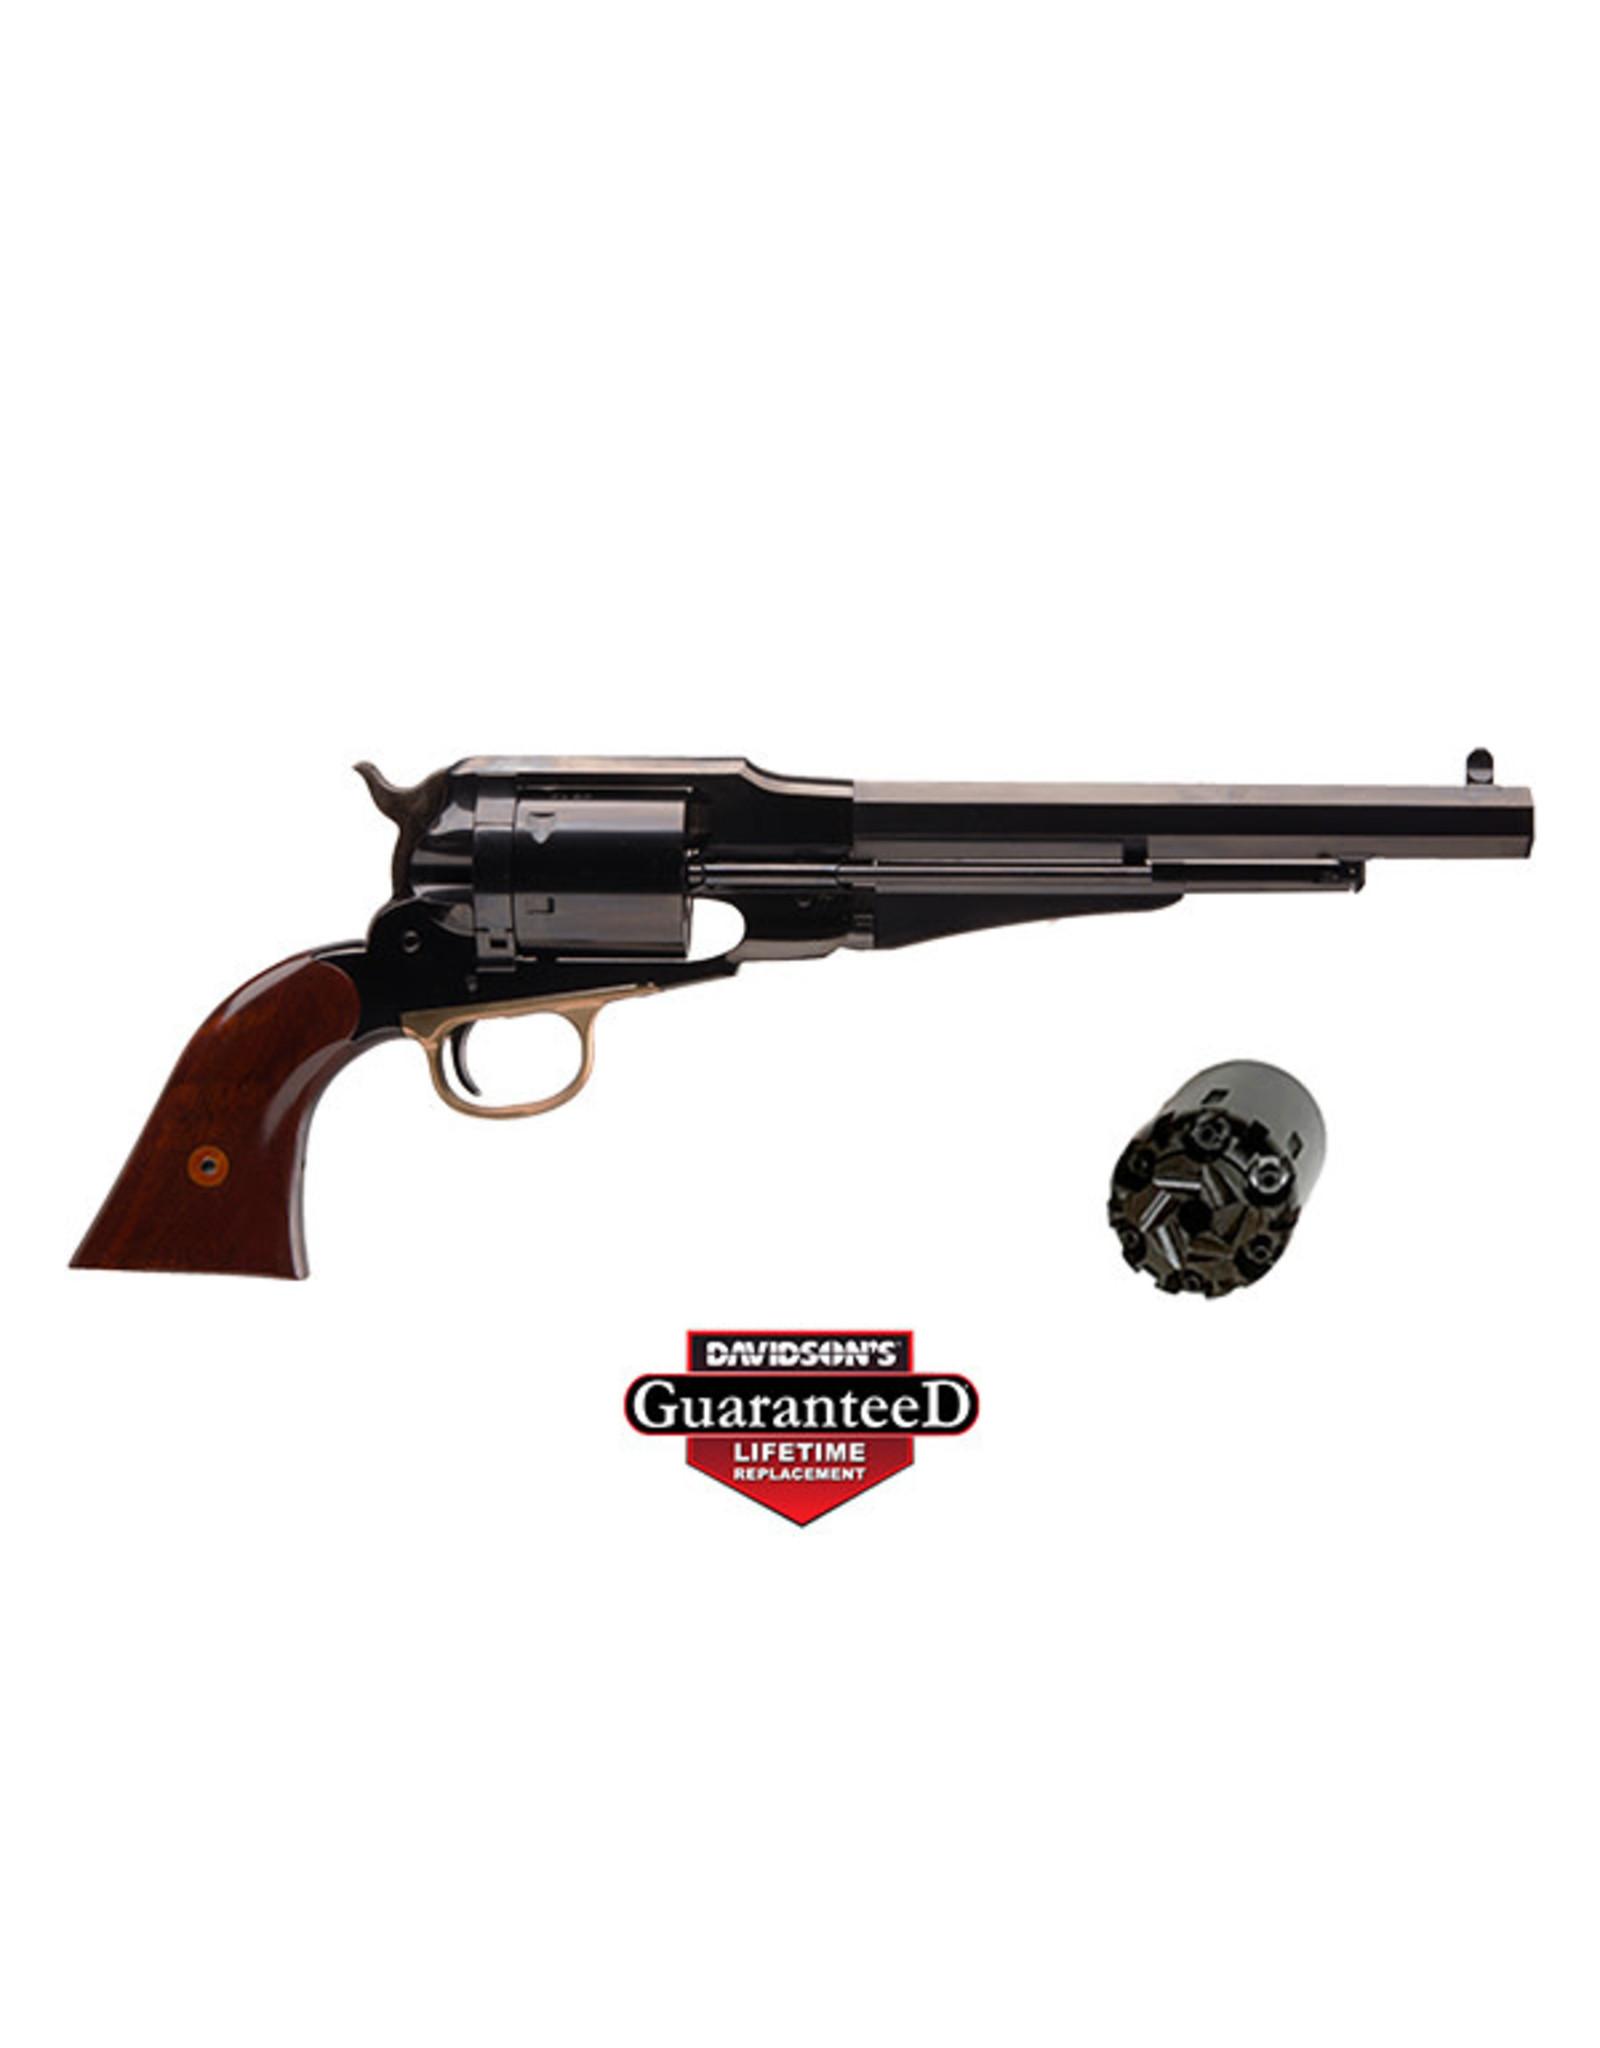 "Cimmeron Preacher .45 Colt/.44 Black Powder 8"" Oct bbl 6 Shot"